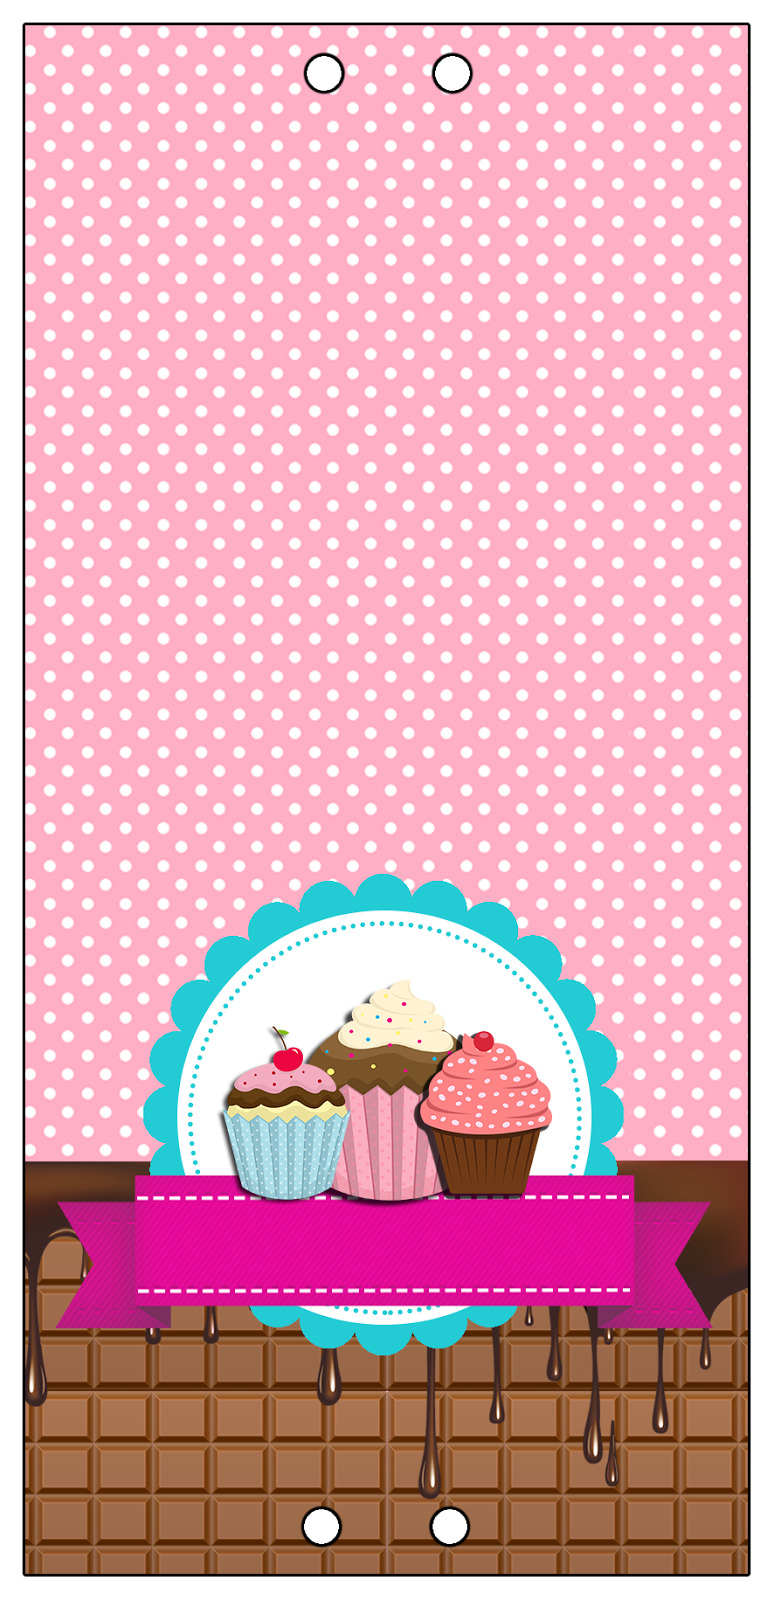 convites digitais simples kit de personalizados tema festa cupcake